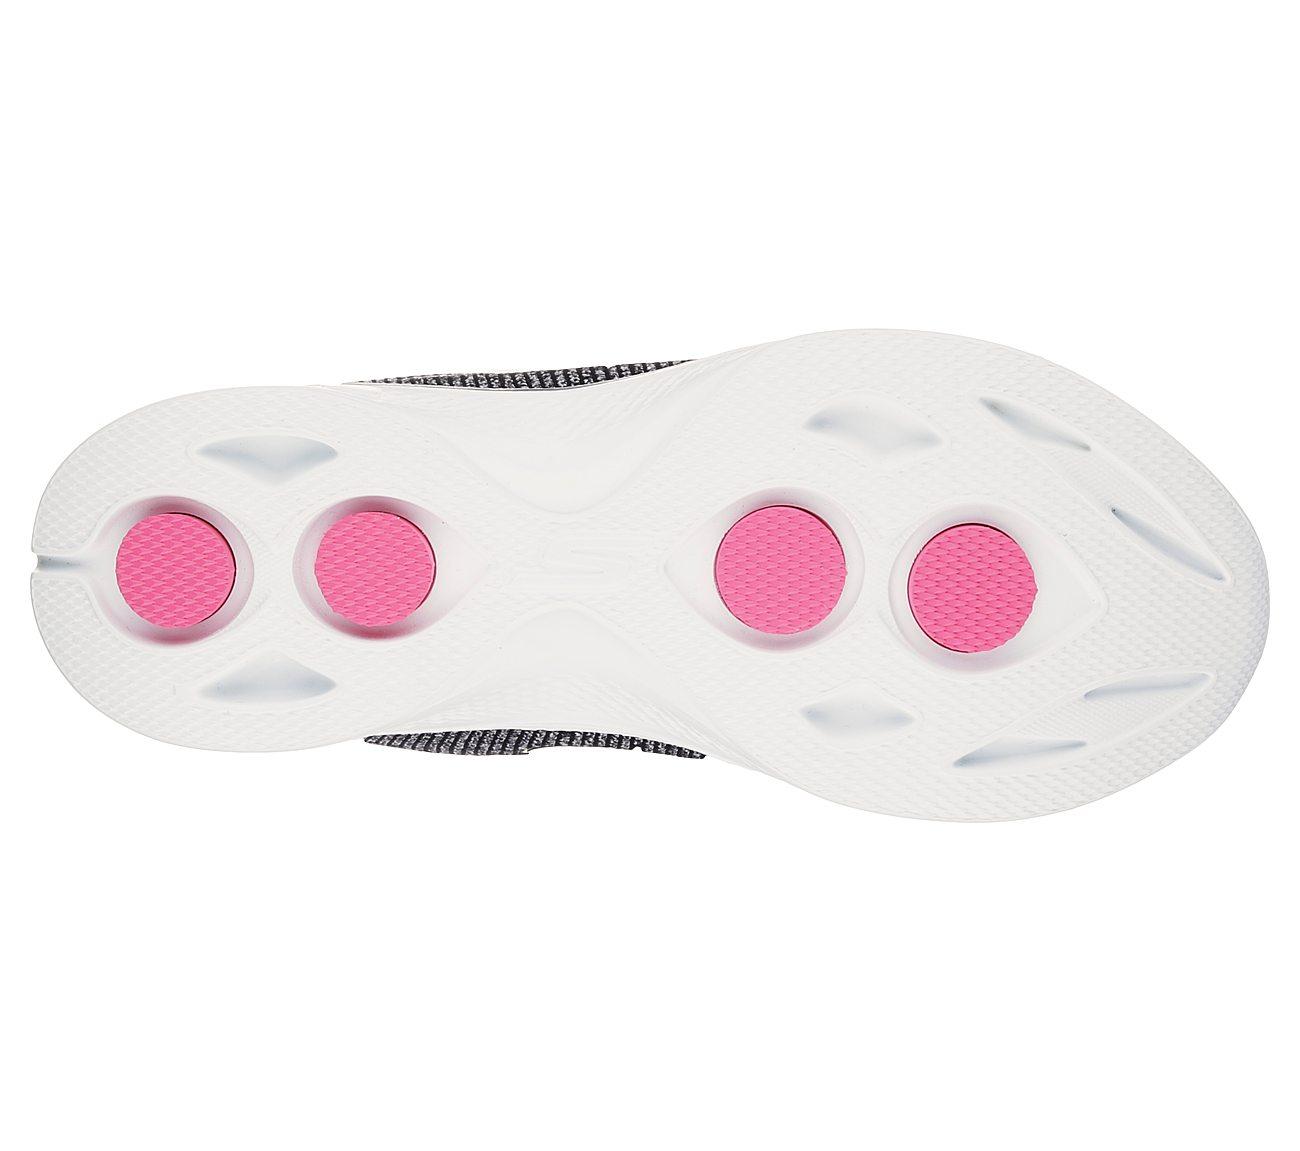 Buy SKECHERS Skechers GOwalk 4 - Cherish Skechers Performance Shoes only  $70.00